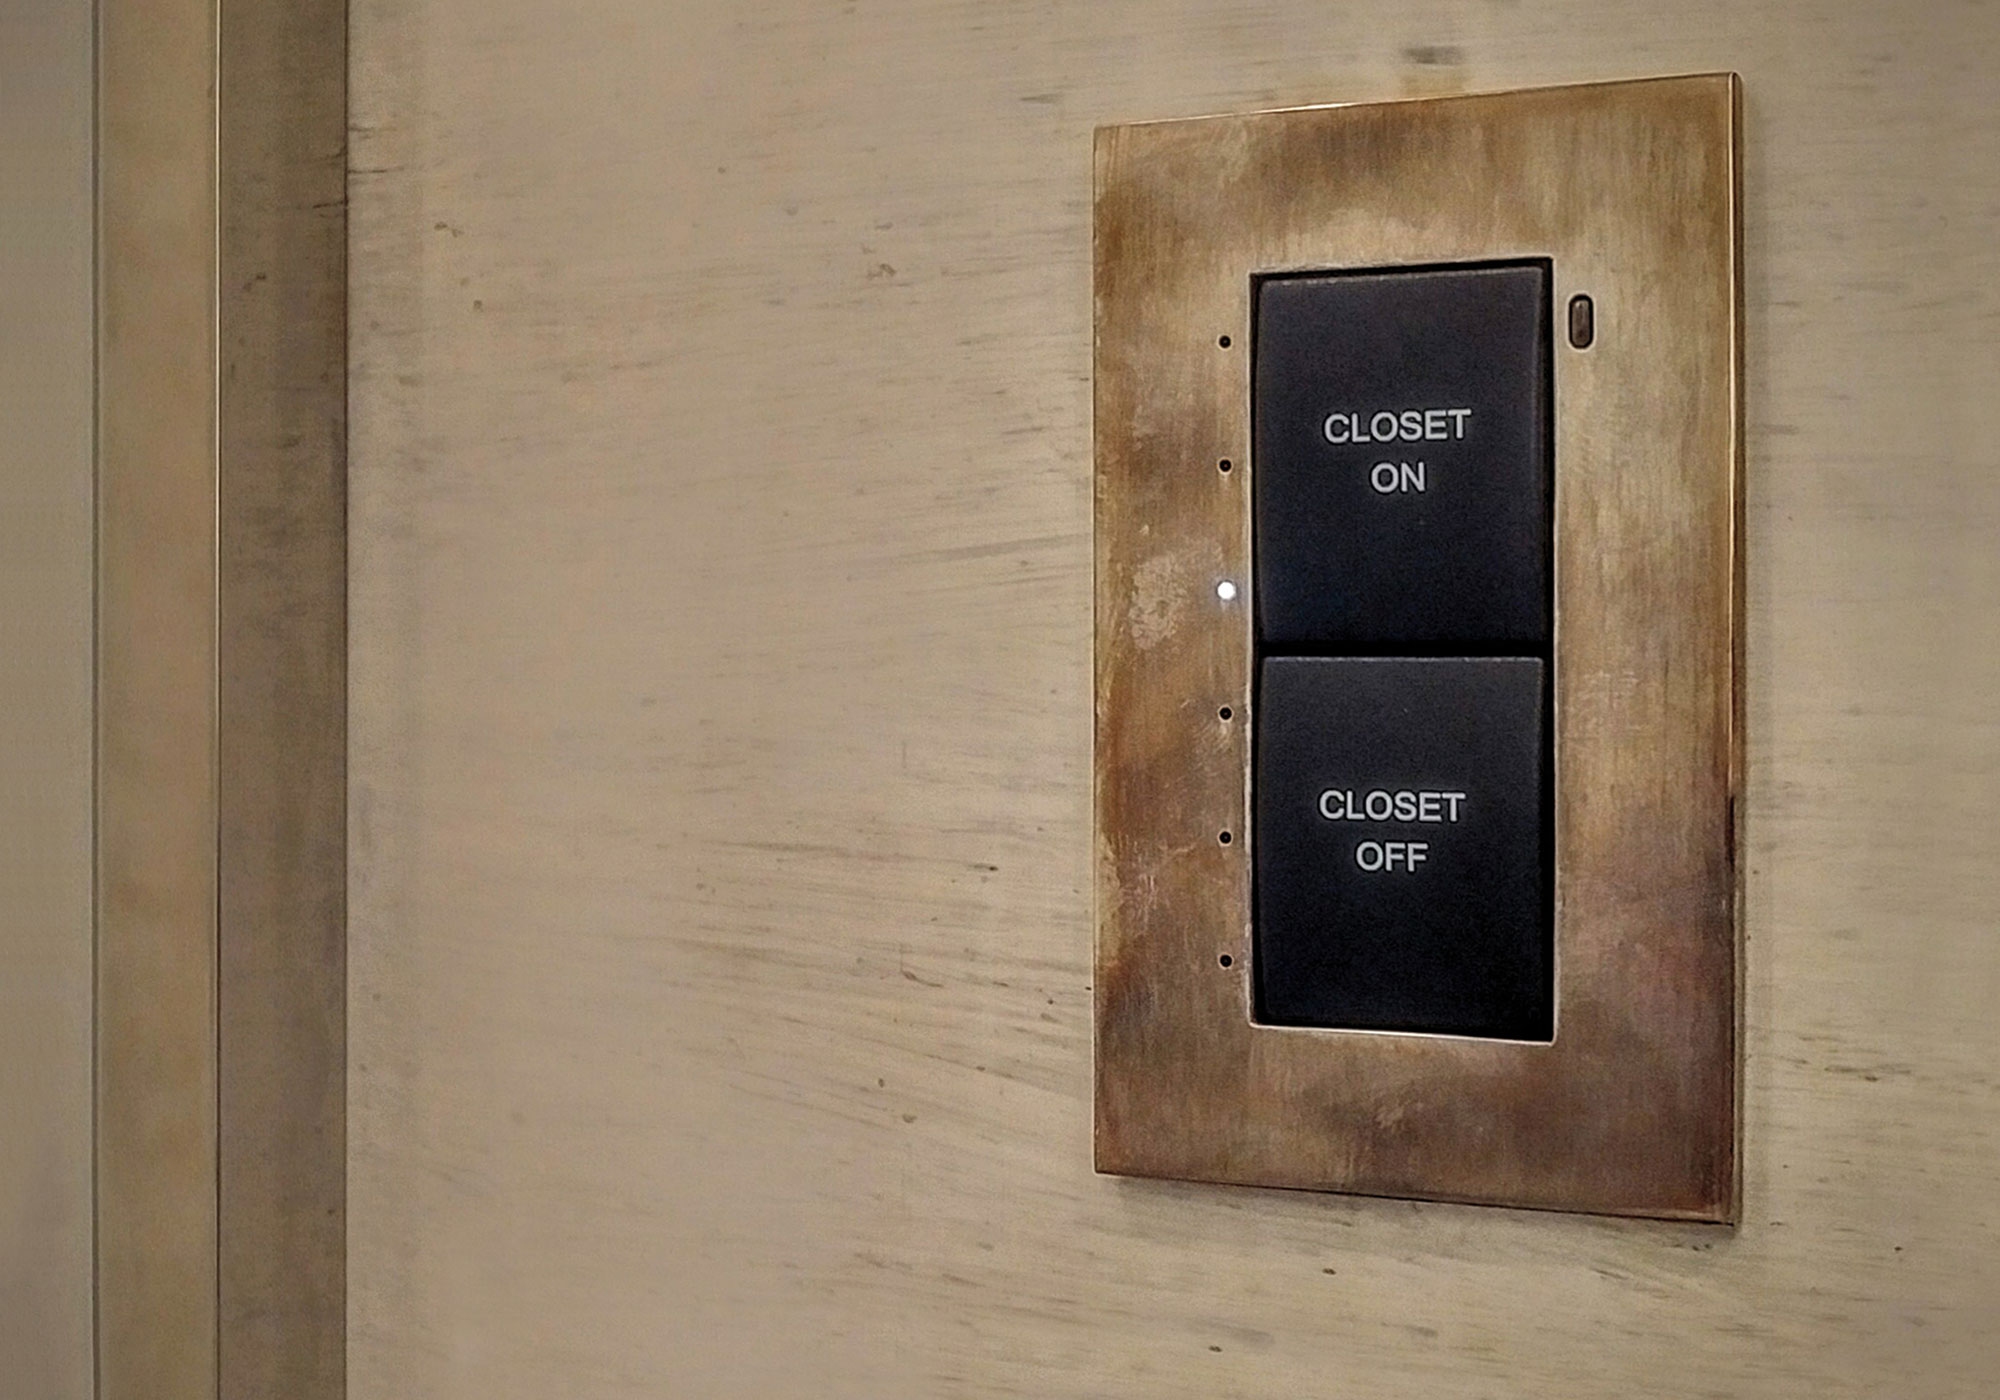 keypad, presets, brass